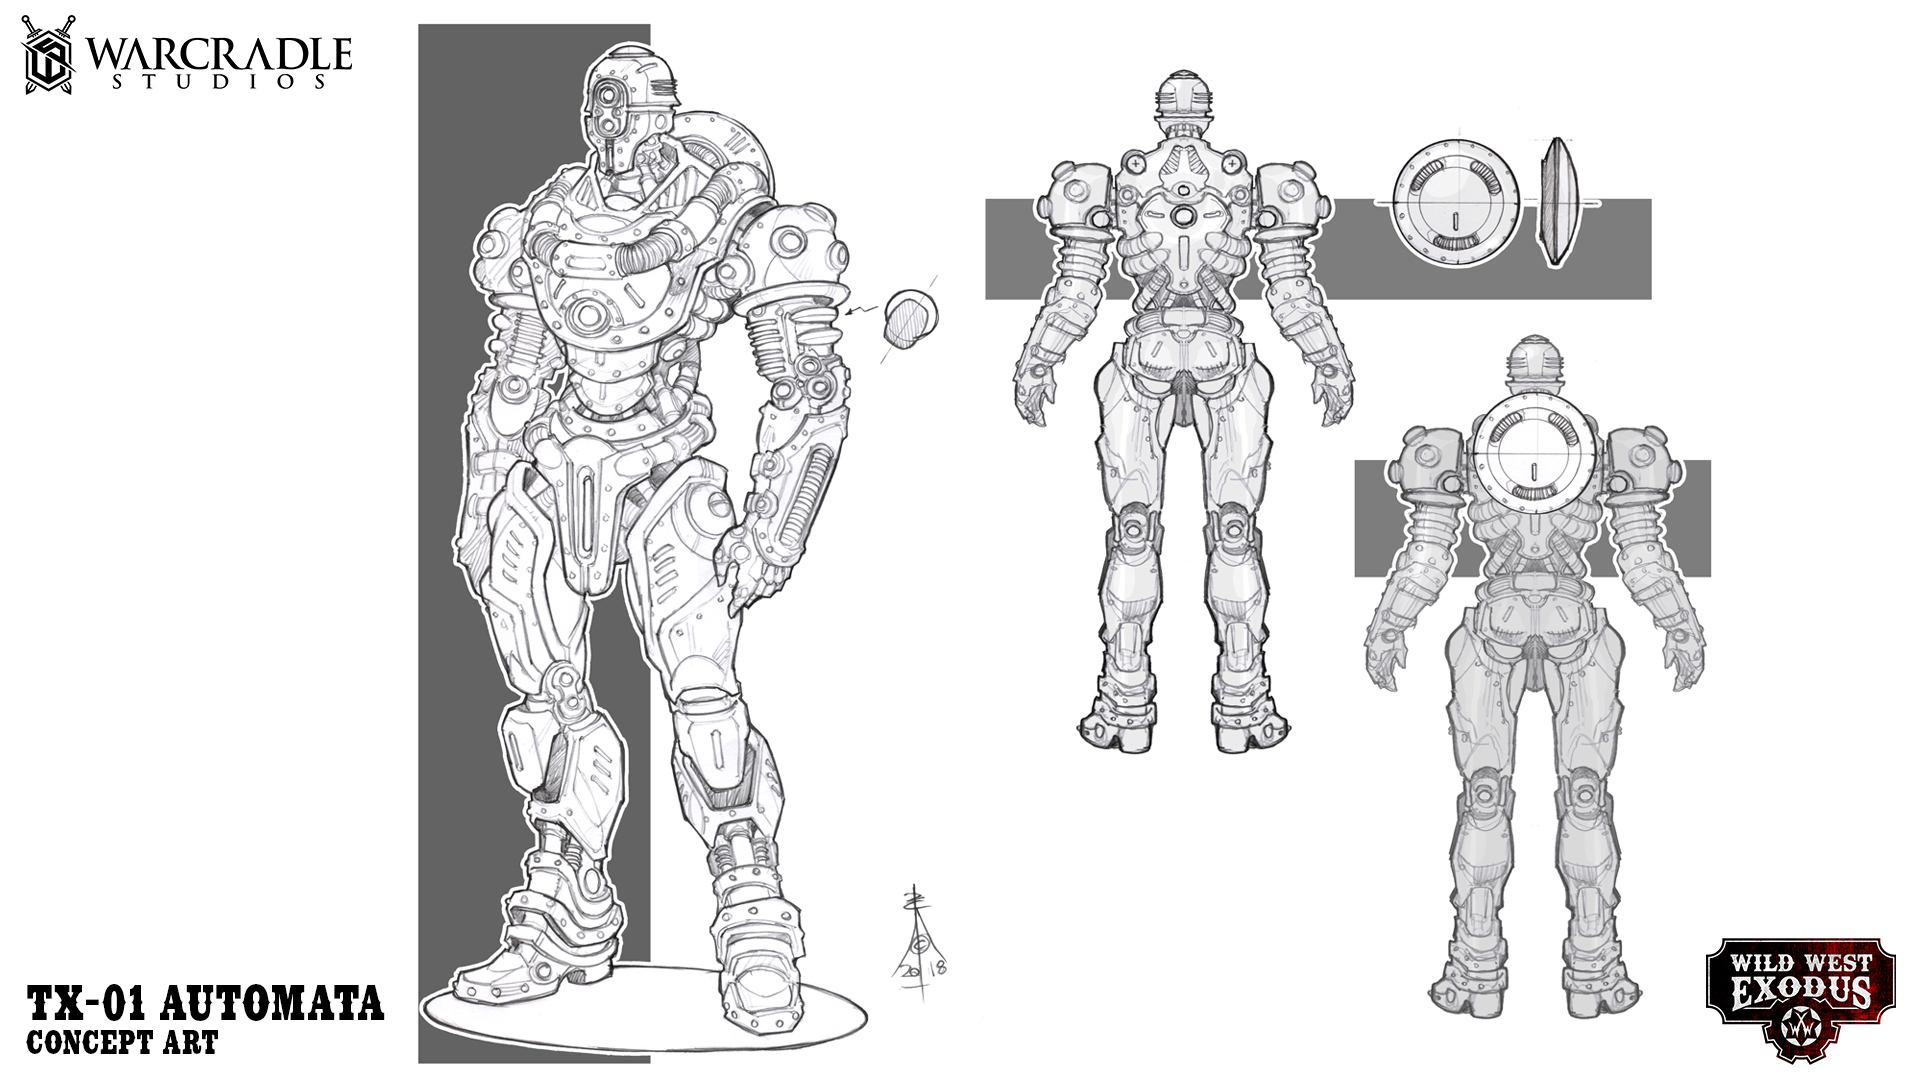 WWX_Concept art TX-01 Automata_PREVIEW.jpg